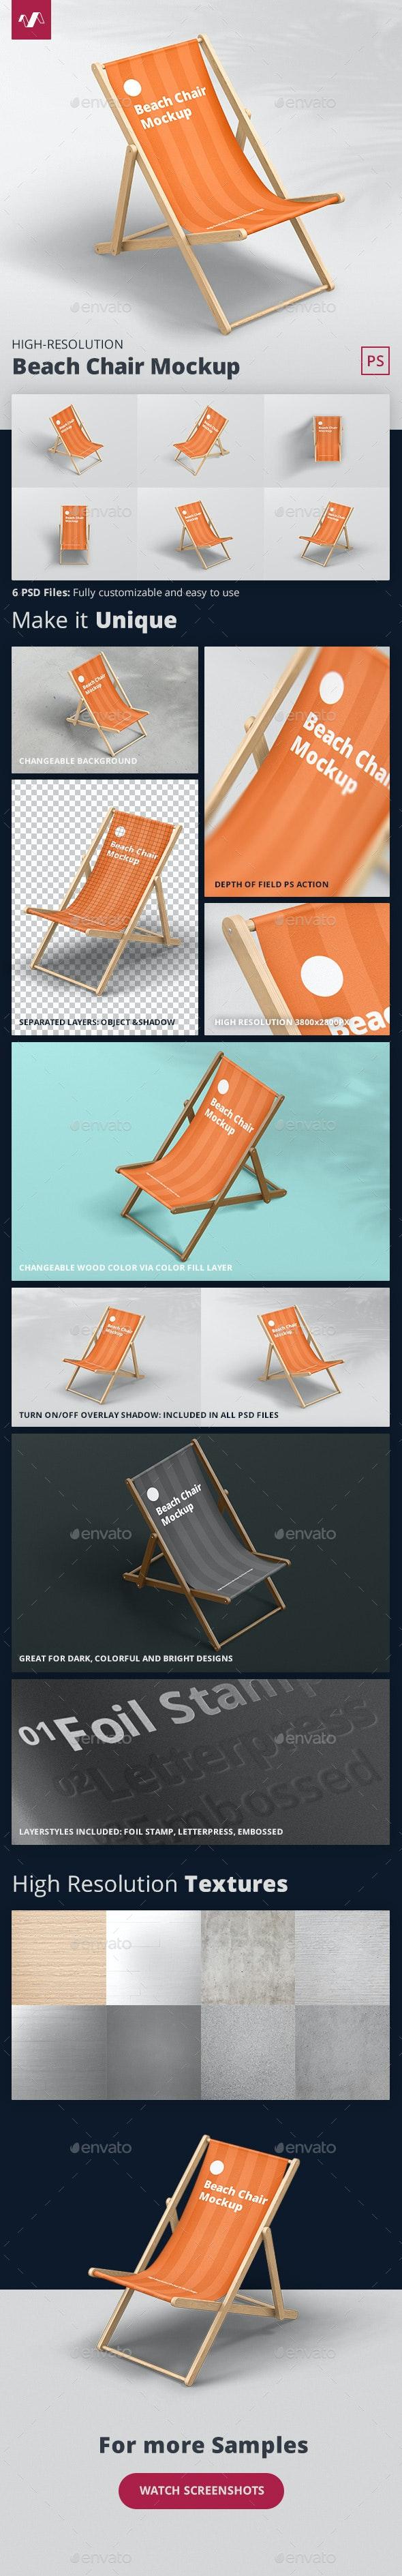 Beach Chair Mockup - Miscellaneous Print